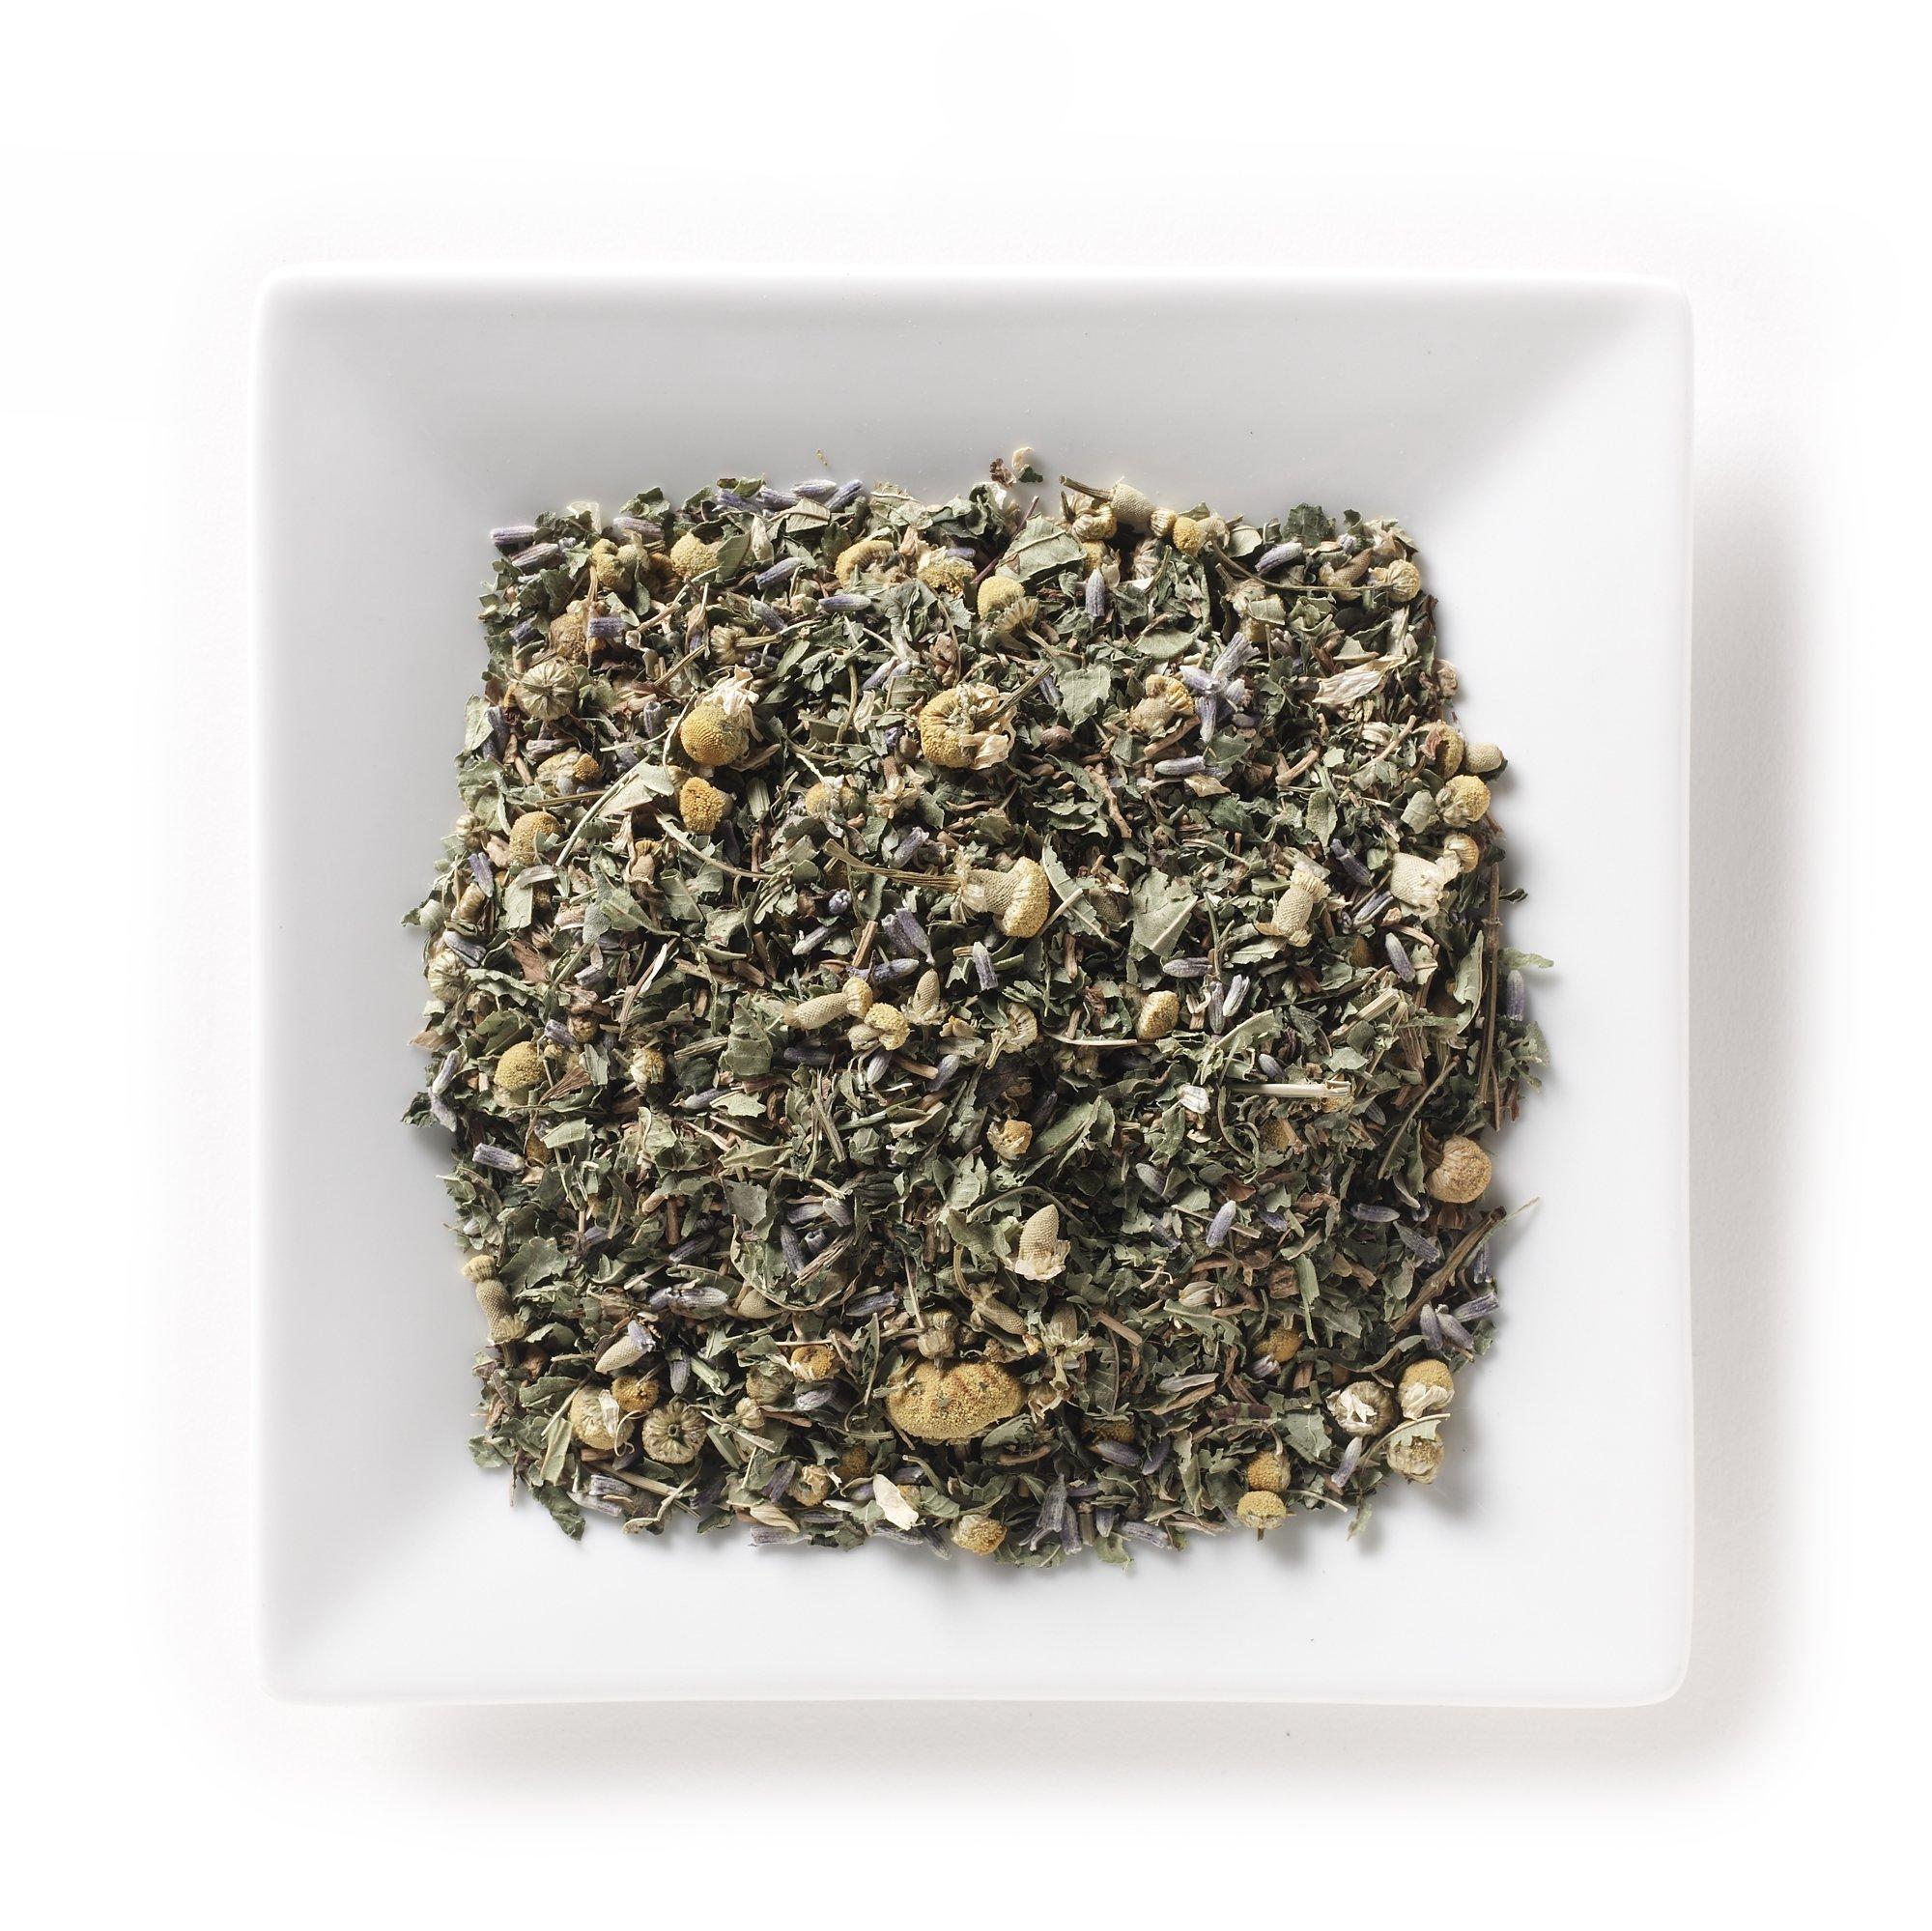 Mahamosa Herbal Herb Tea Blend and Tea Infuser Set: 4 oz Pacific Calm Organic Herbal Tea, 1 Stainless Steel Tea Ball Infuser (Bundle- 2 items)(Tea ingredients: Organic valerian root, organic lemon verbena, organic lemon blalm, organic chamomile, organic l